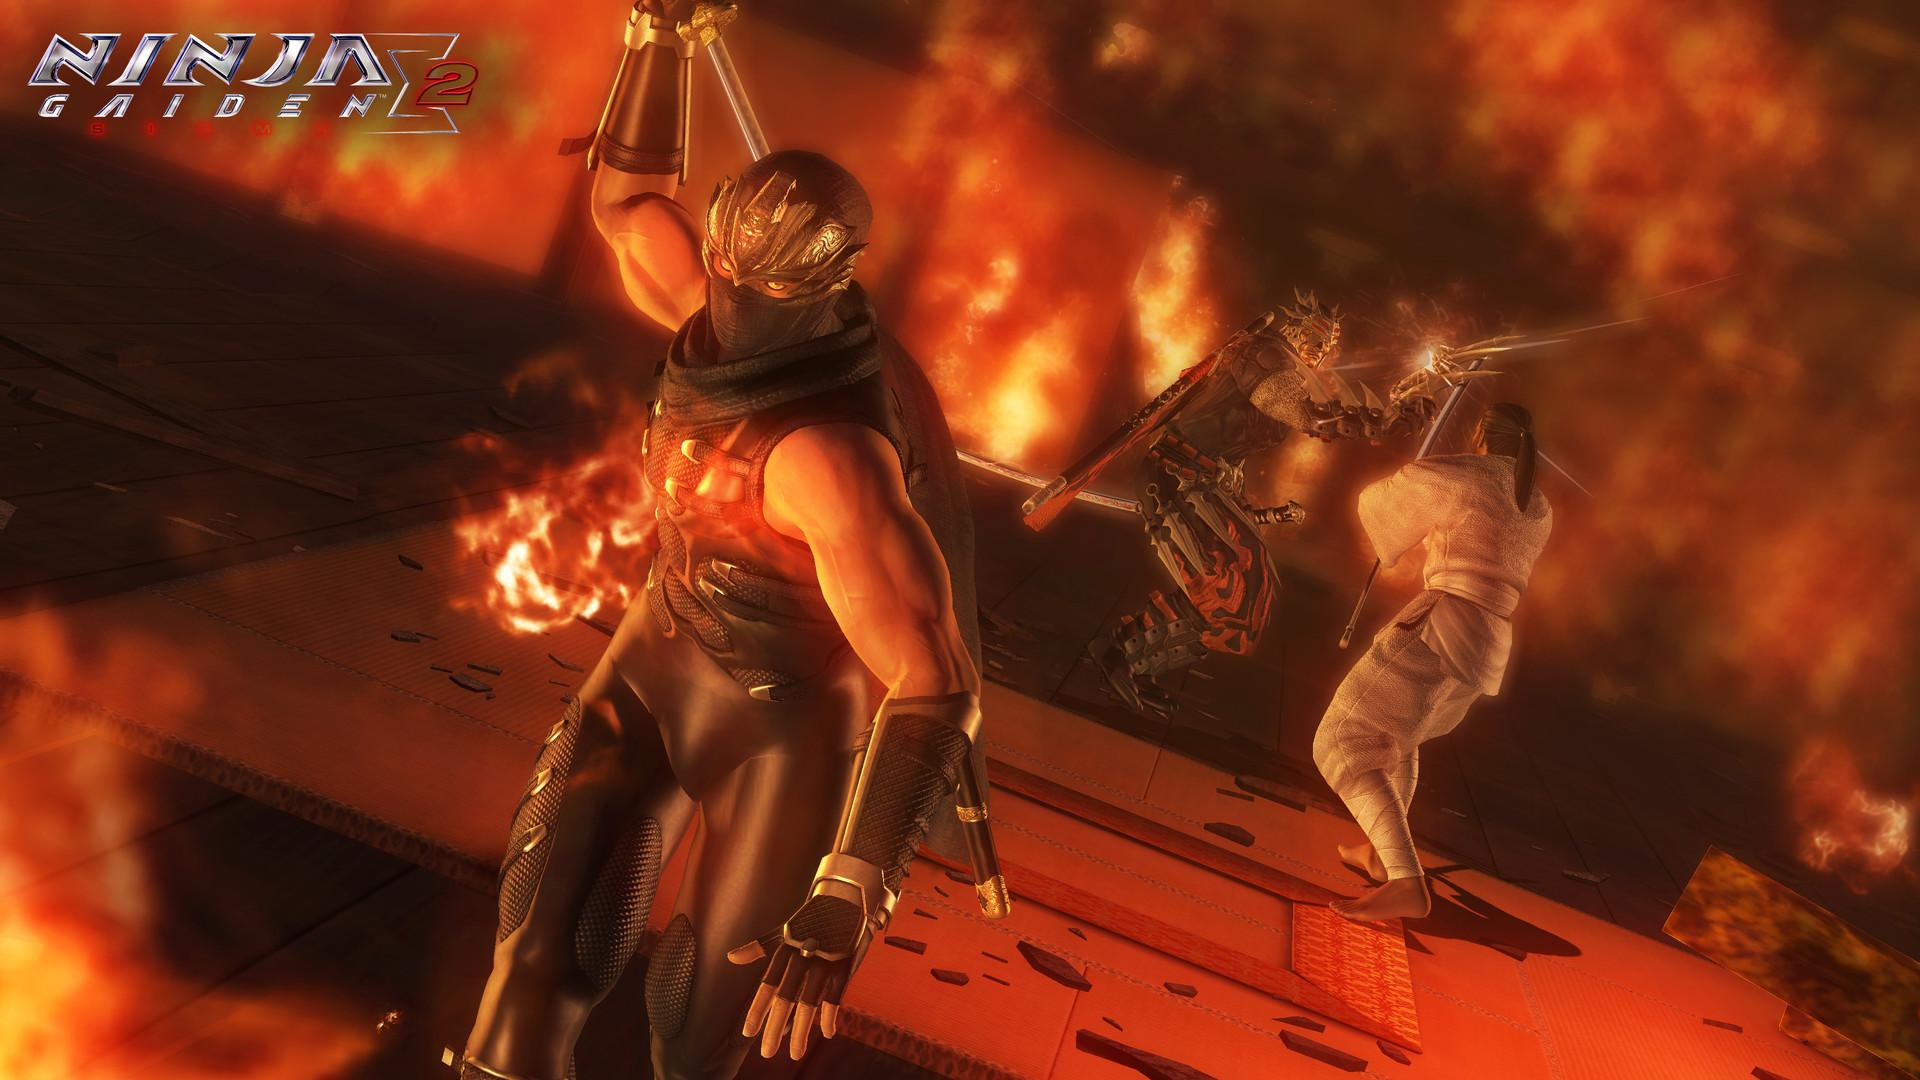 ninja-gaiden-sigma-2-pc-screenshot-3